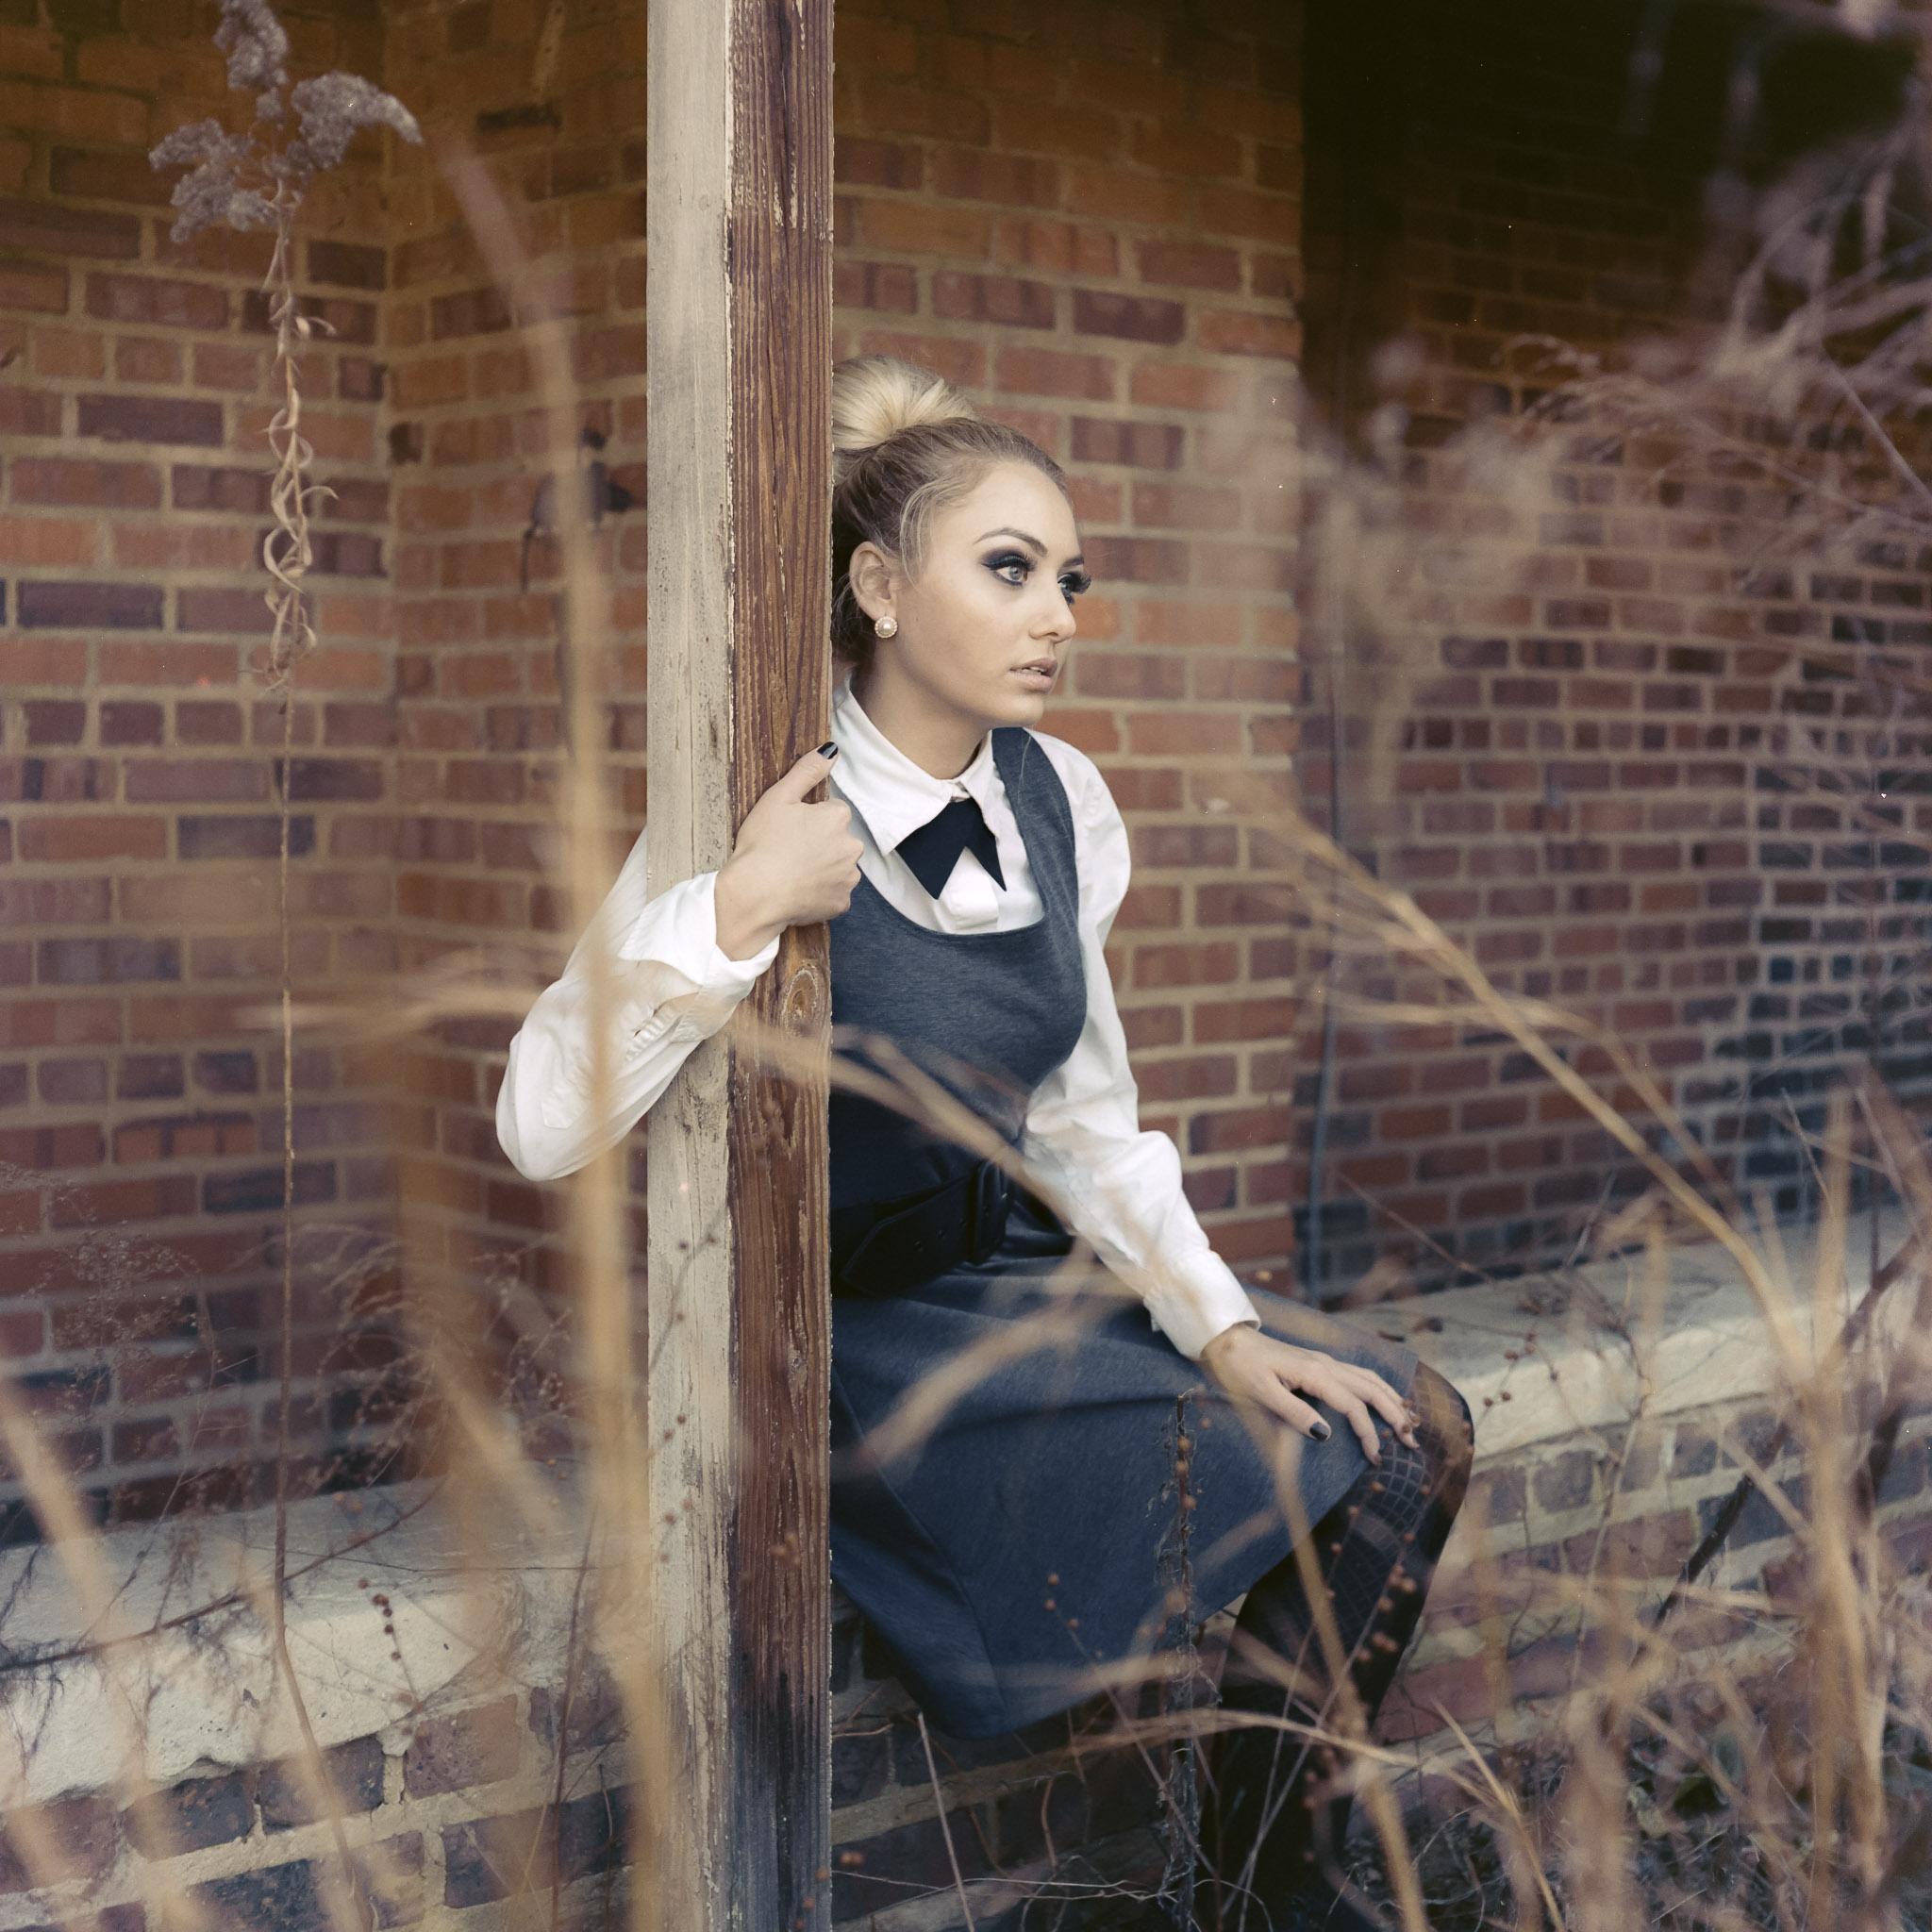 Model: Morgan Rice  Camera: Hasselblad 501cm  Film: Portra 400